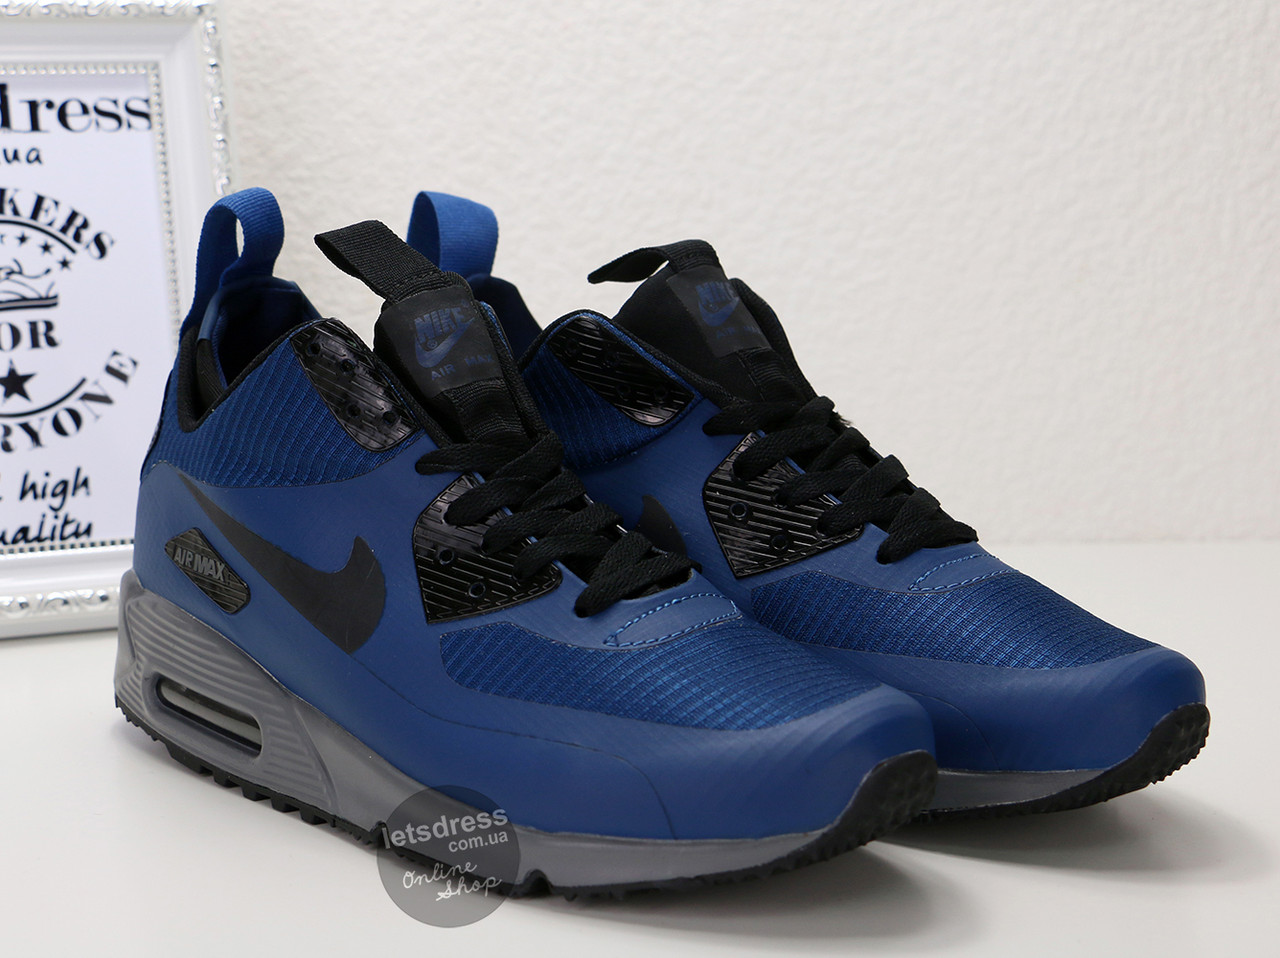 Кроссовки мужские Nike Air Max 90 Mid Winter | Найк Аир Макс 90 Мид